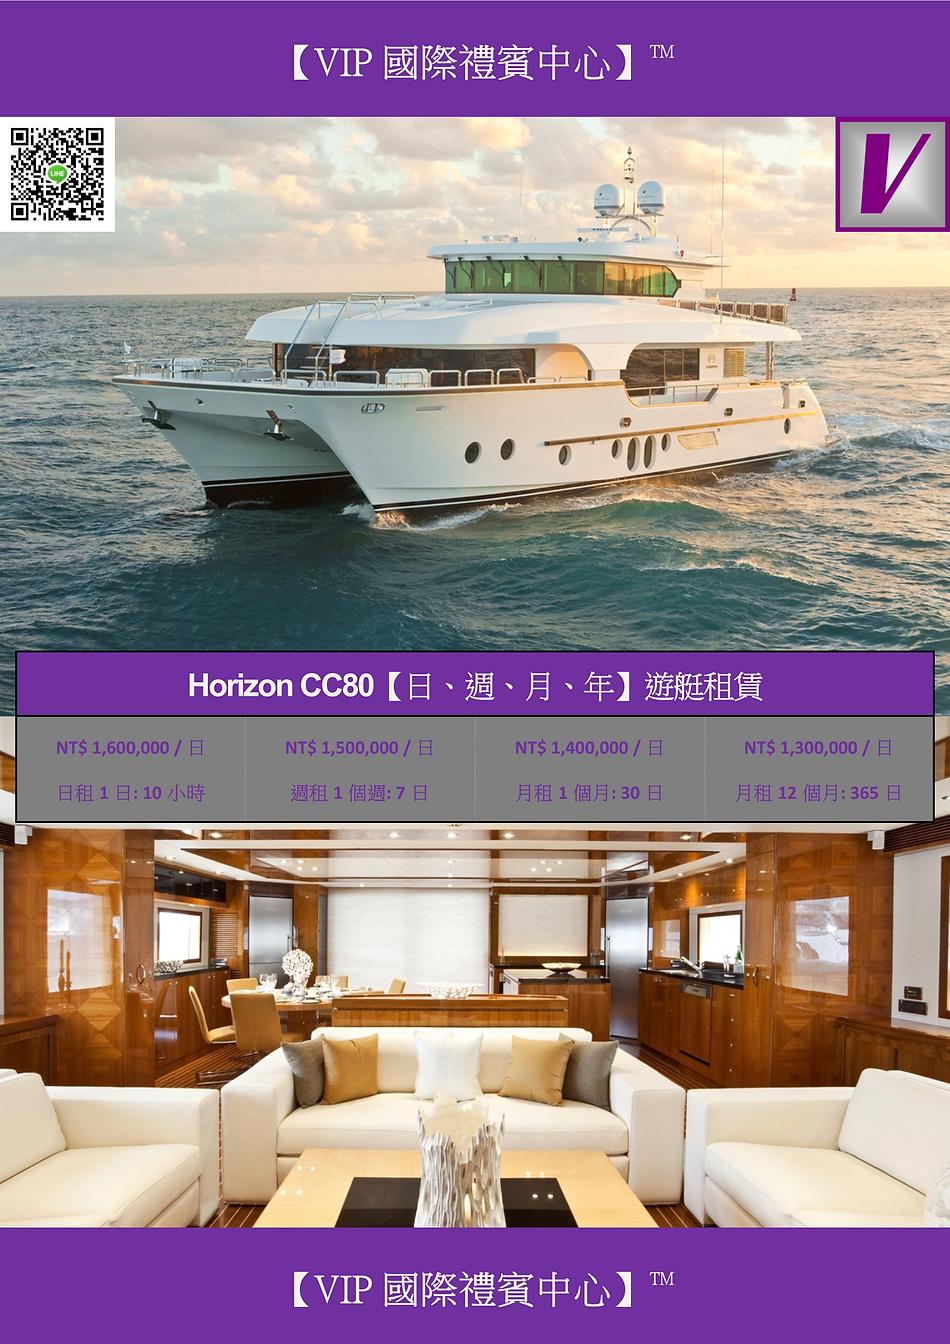 VIP國際禮賓中心 HORIZON CC80 DM.png